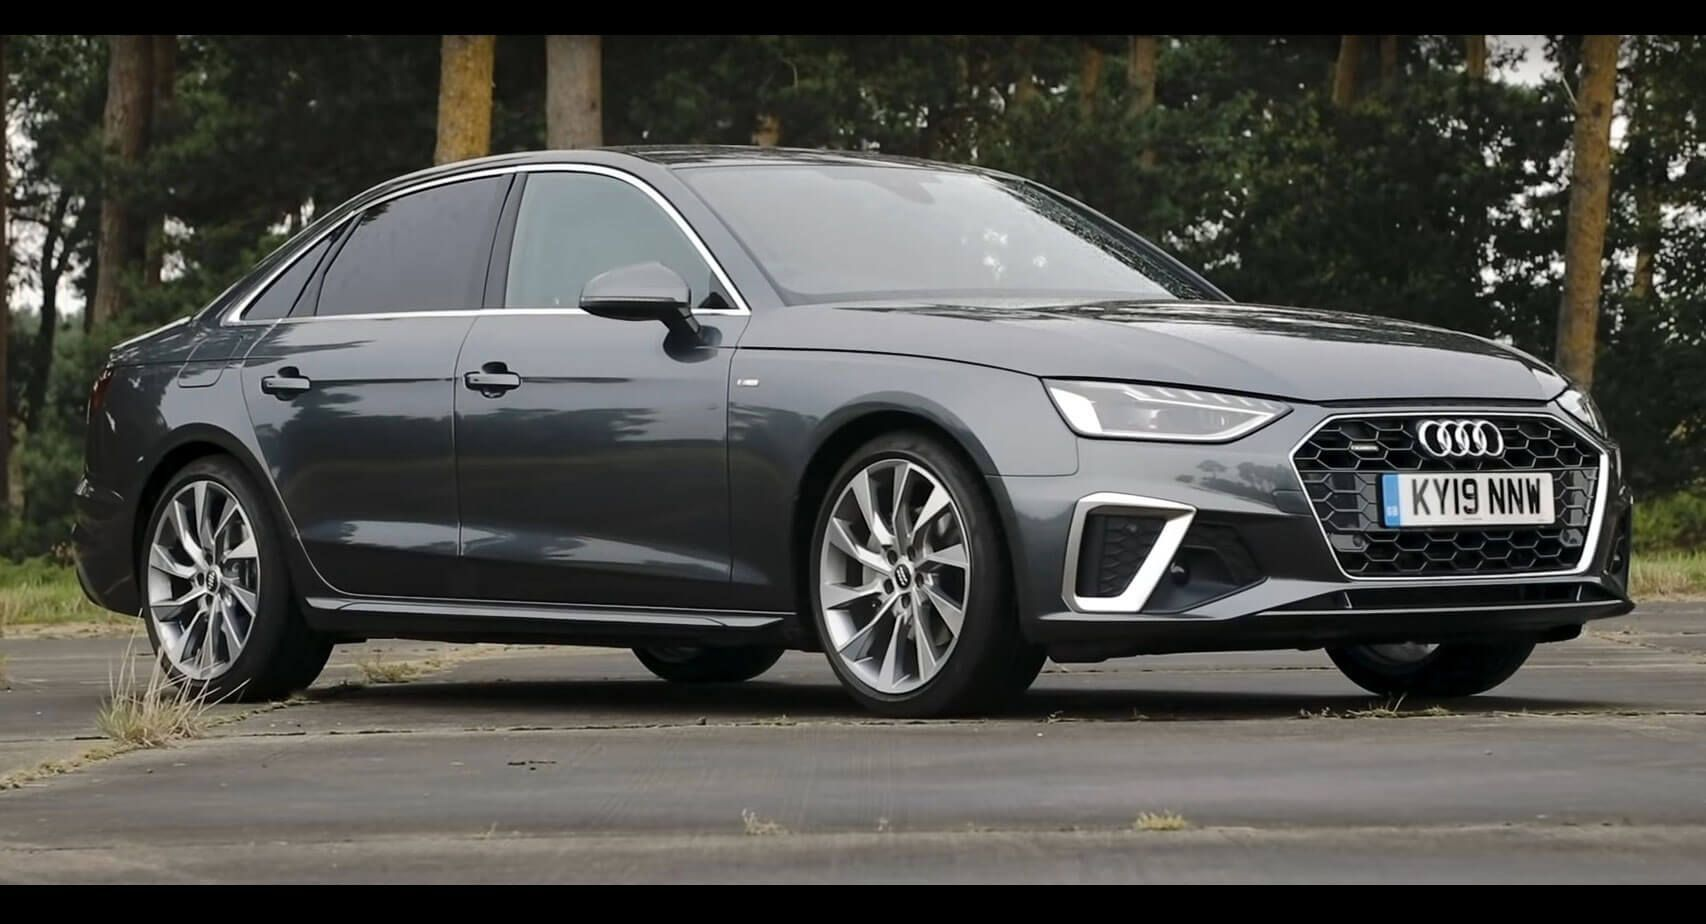 Do The 2020 Audi A4 Facelift S Revisions Make It More Interesting Audi Audia4 Audivideos Reviews Video Cars Carsofinstagram Ca Audi A4 Audi Audi Sedan